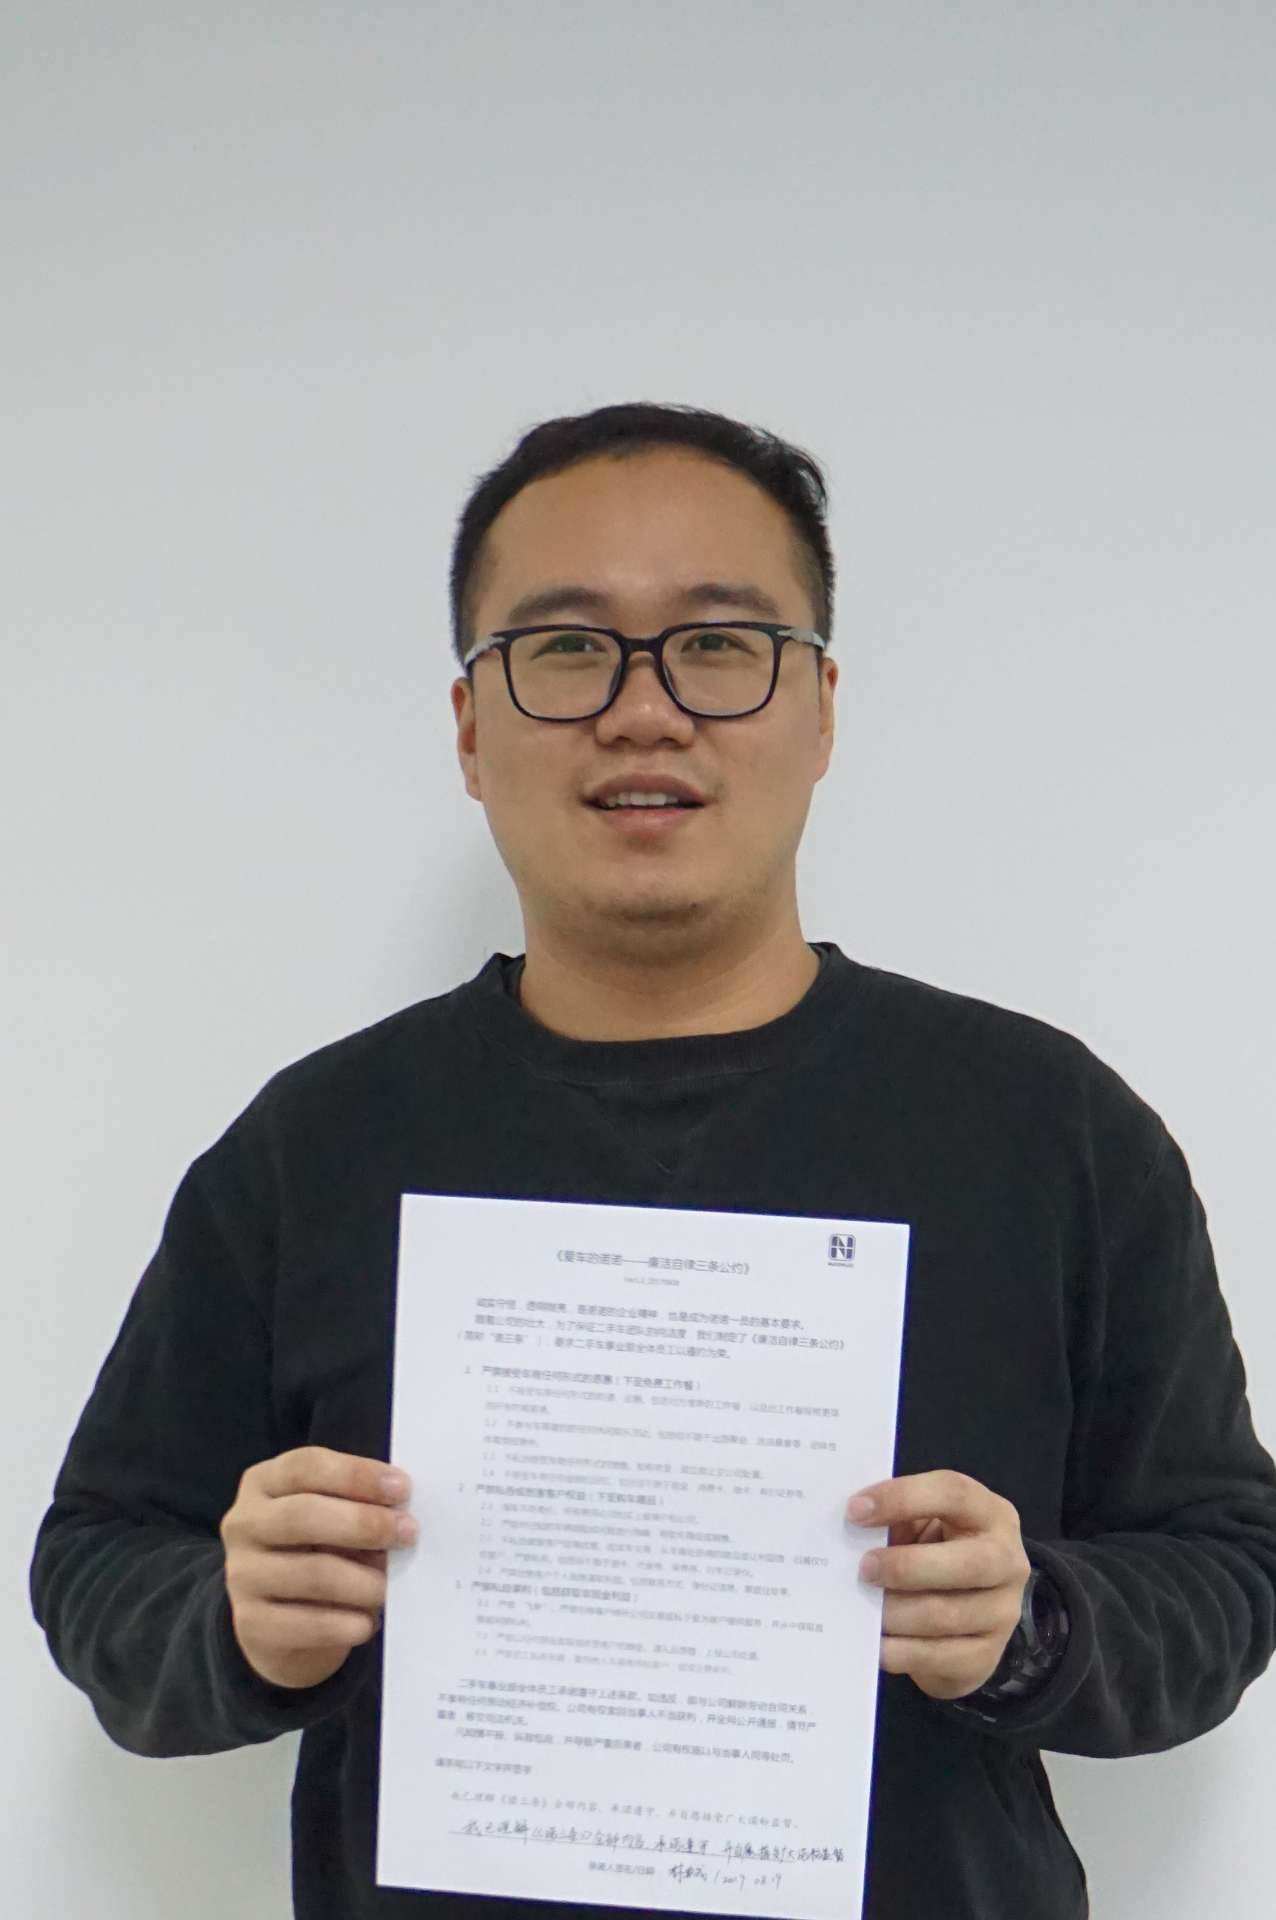 林典成-鉴定师.JPG